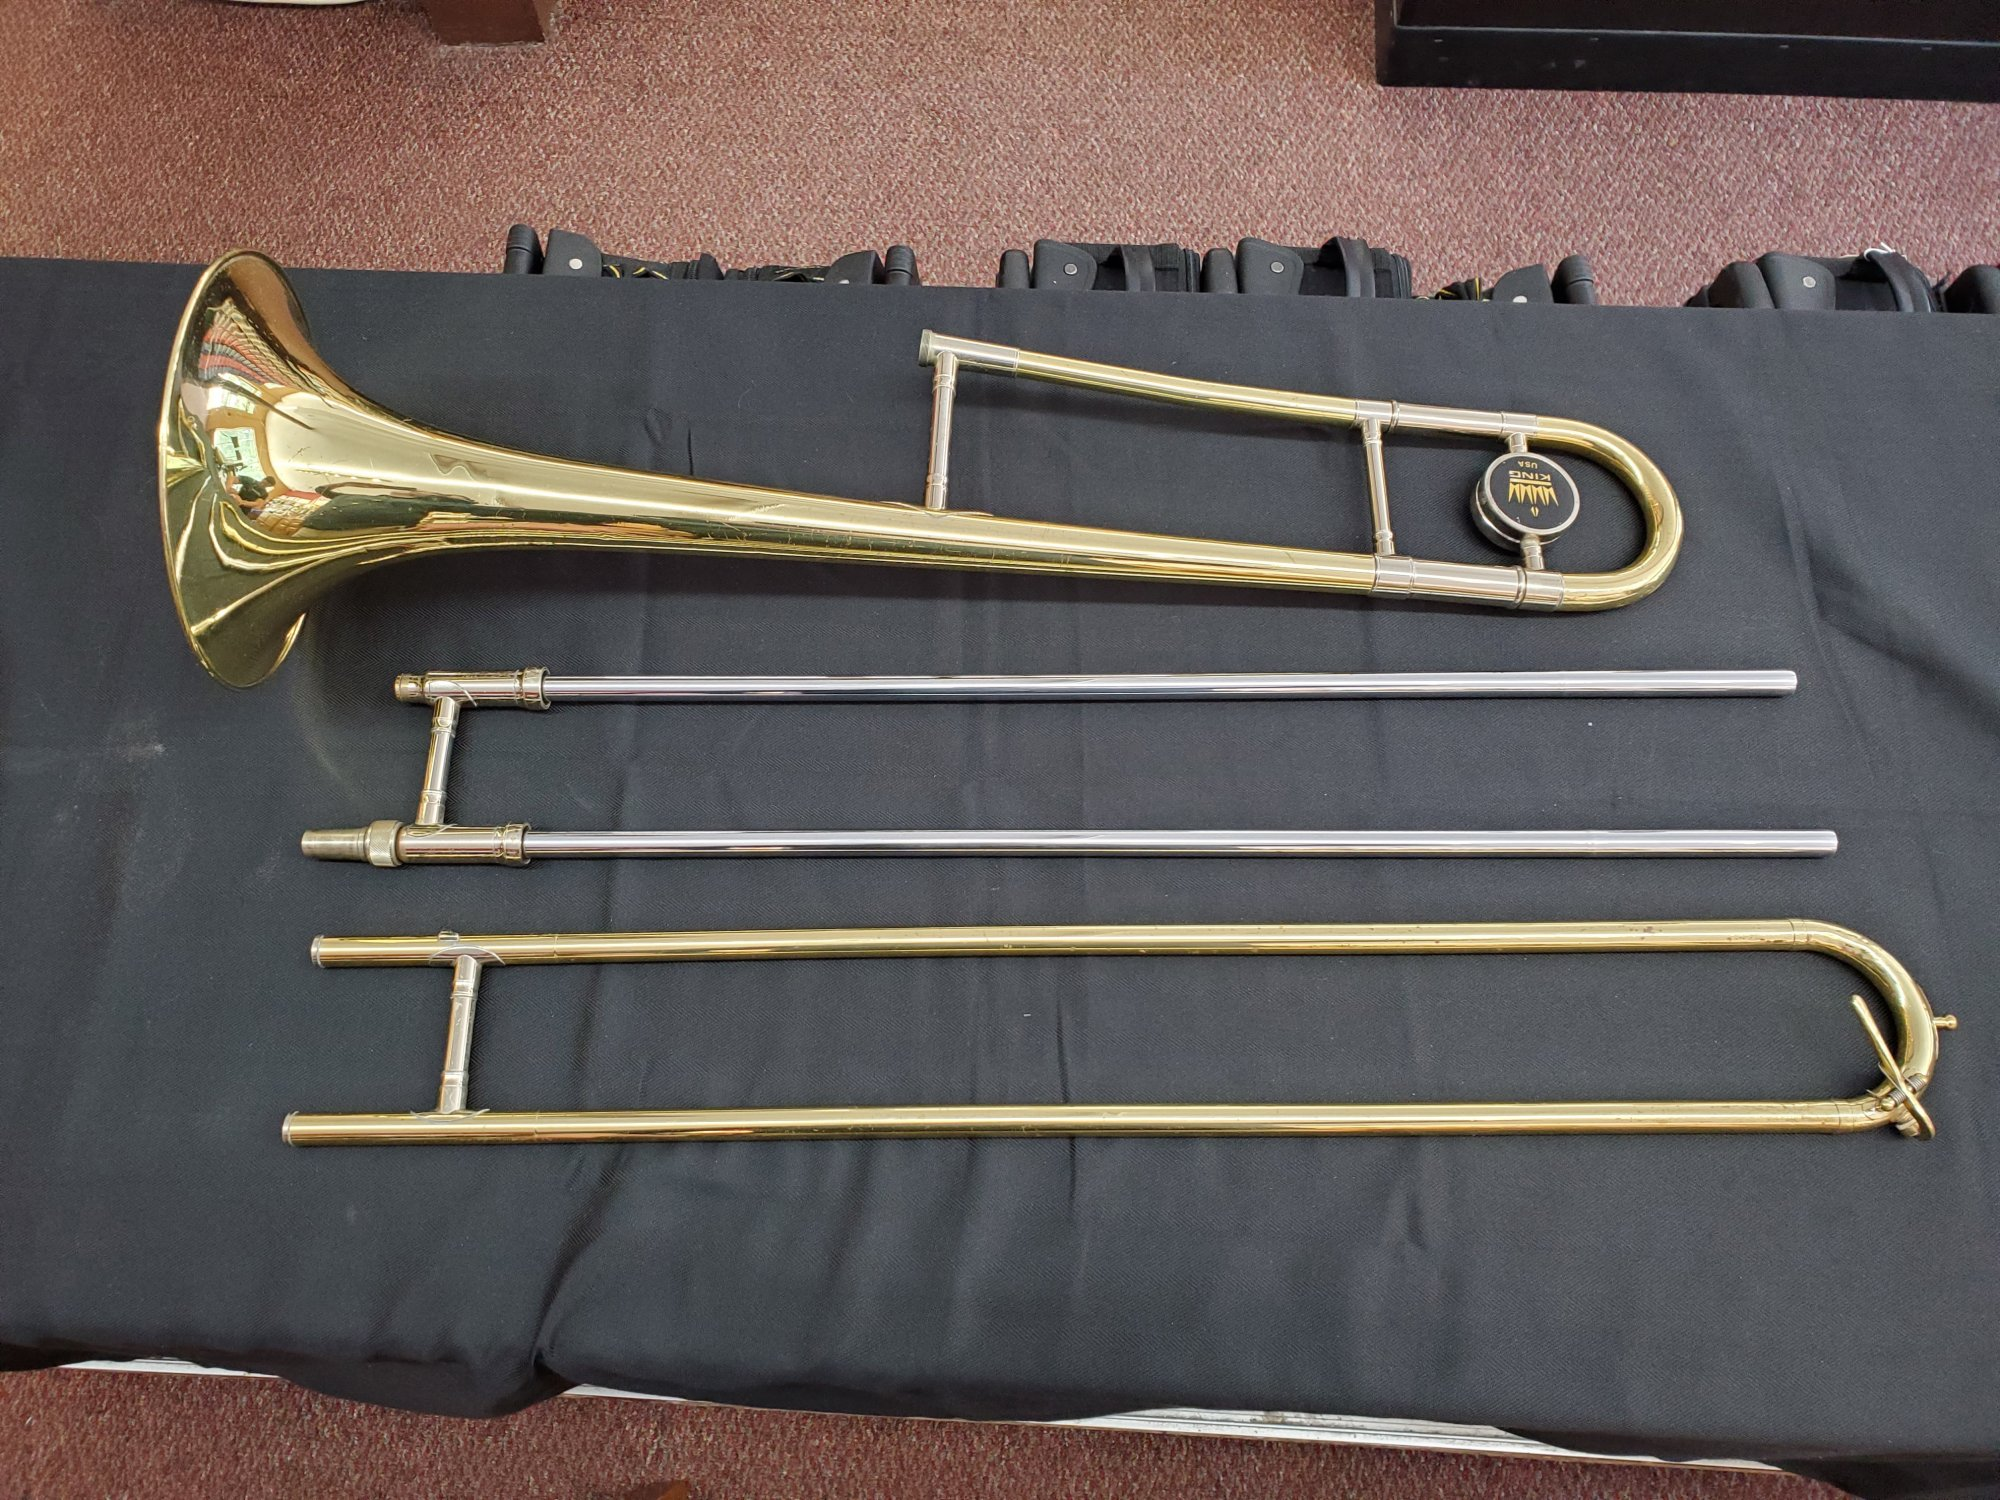 Used King 606 Trombone